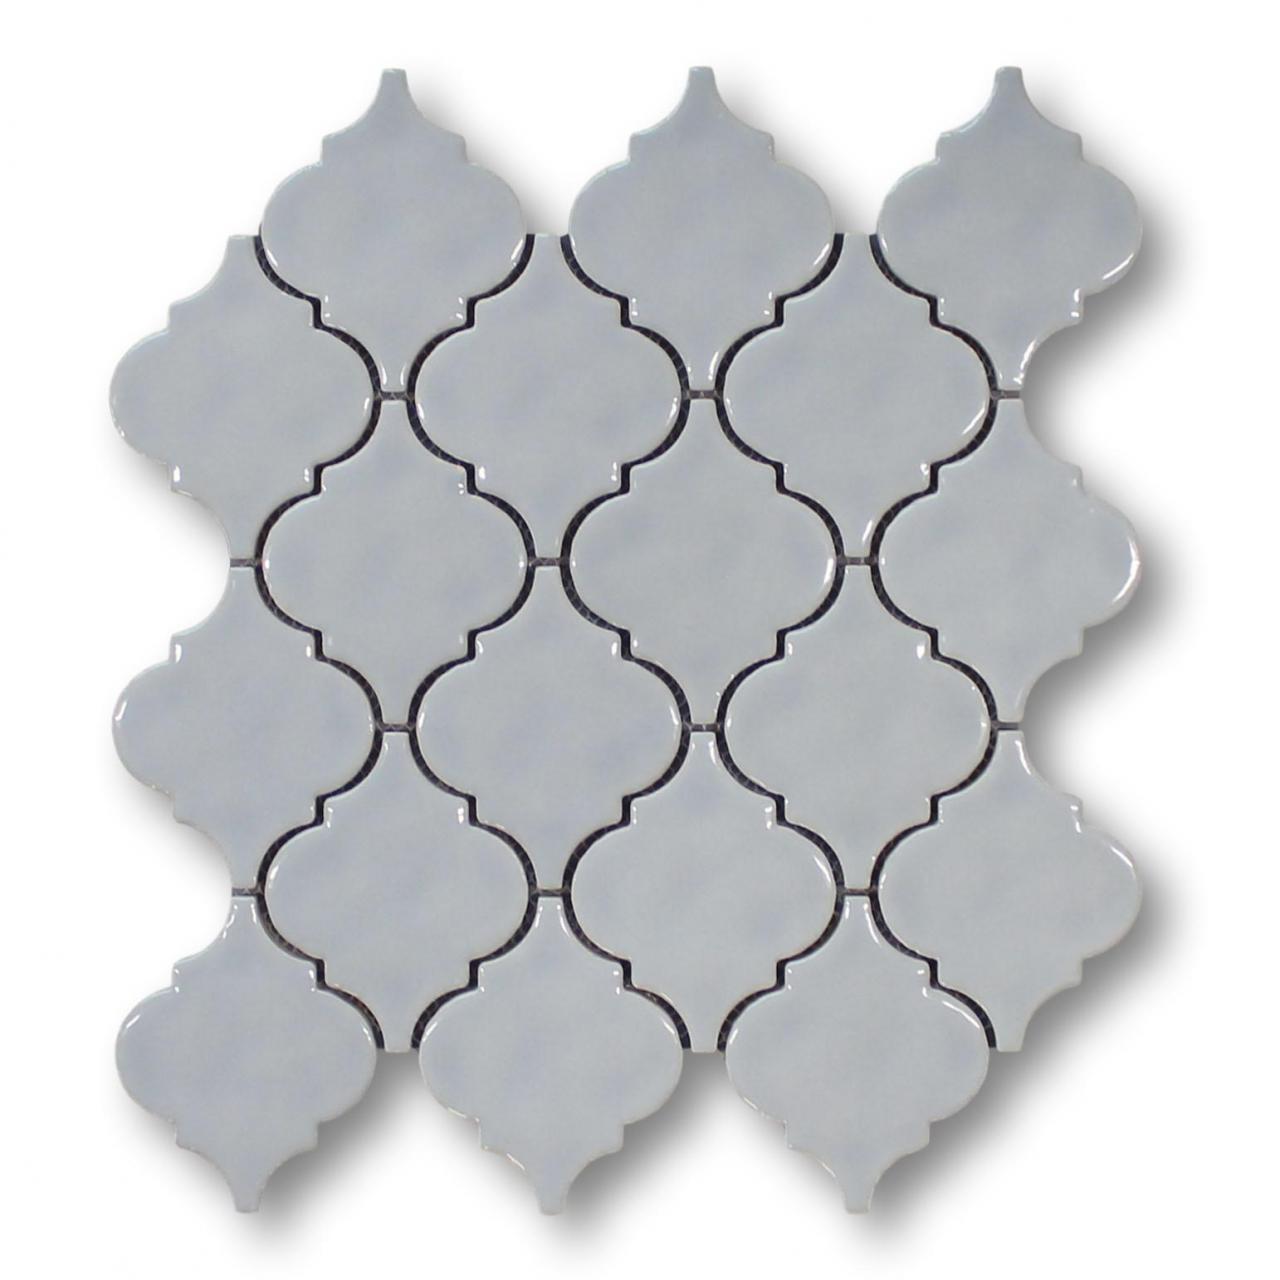 - Cloud Ceramic Arabesque Lantern Mosaic Tiles - Kitchen Backsplash